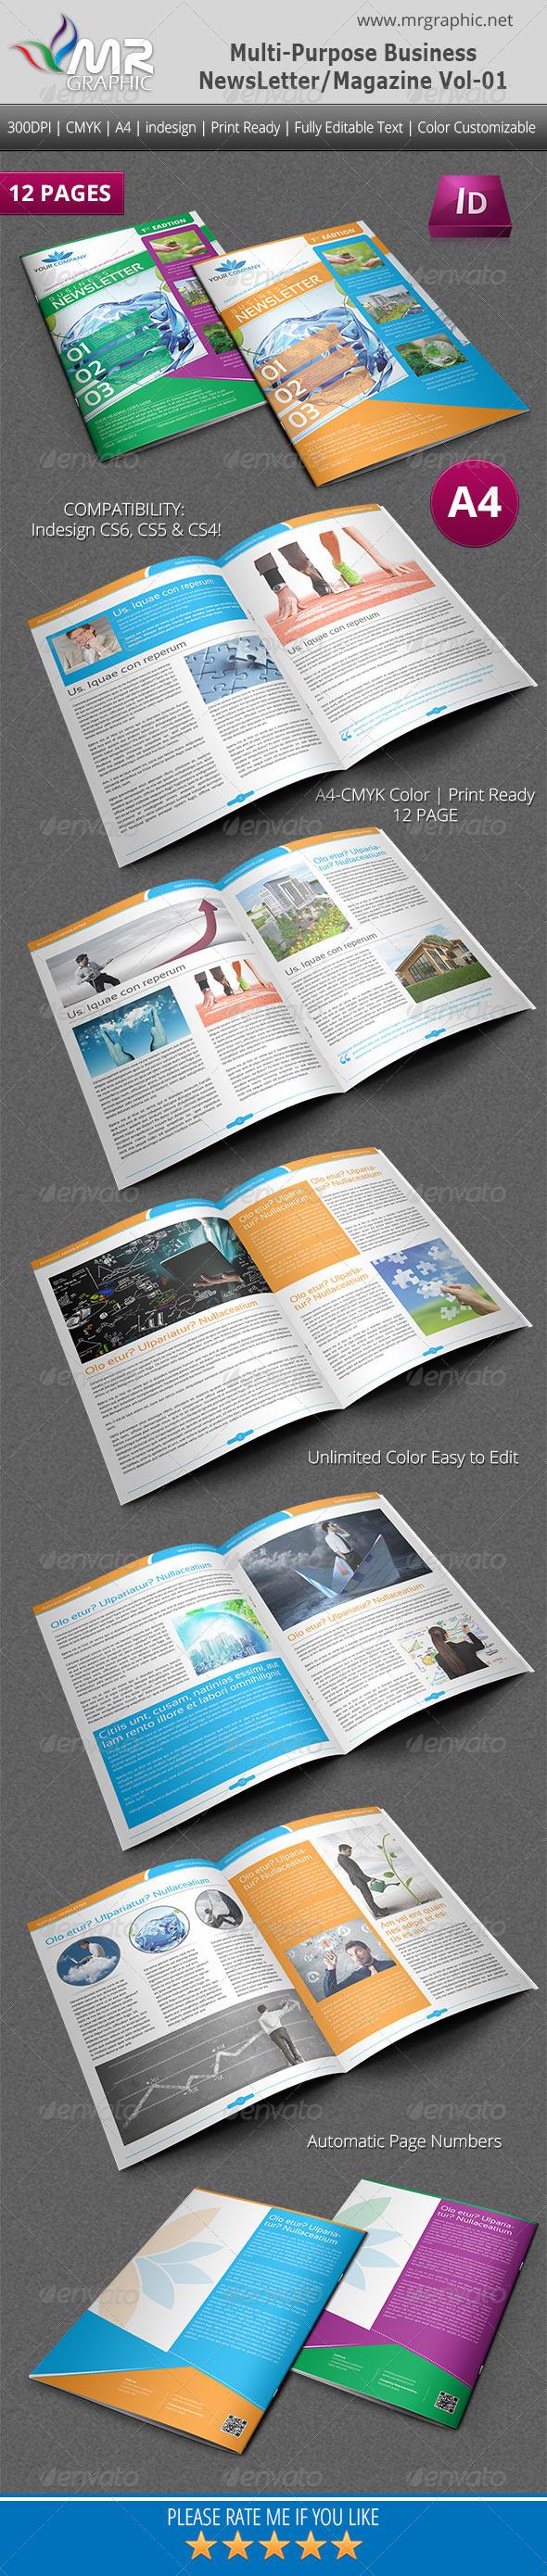 Multipurpose Business Newsletter/Magazine Vol-01 - Newsletters Print Templates